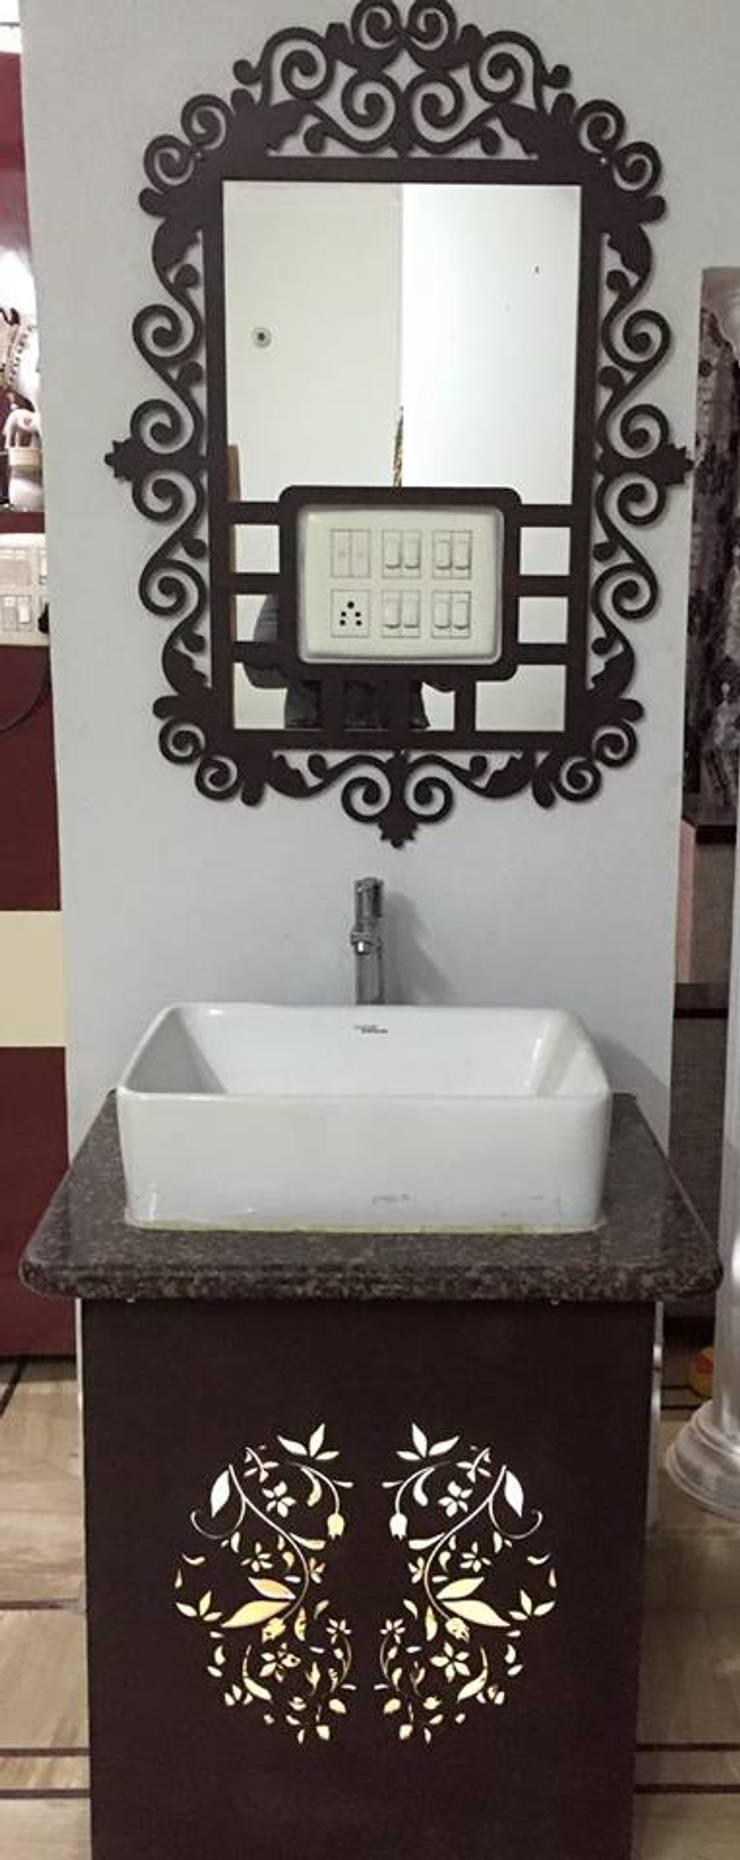 Mangla's Dining Wash basin : modern  by Designelle,Modern